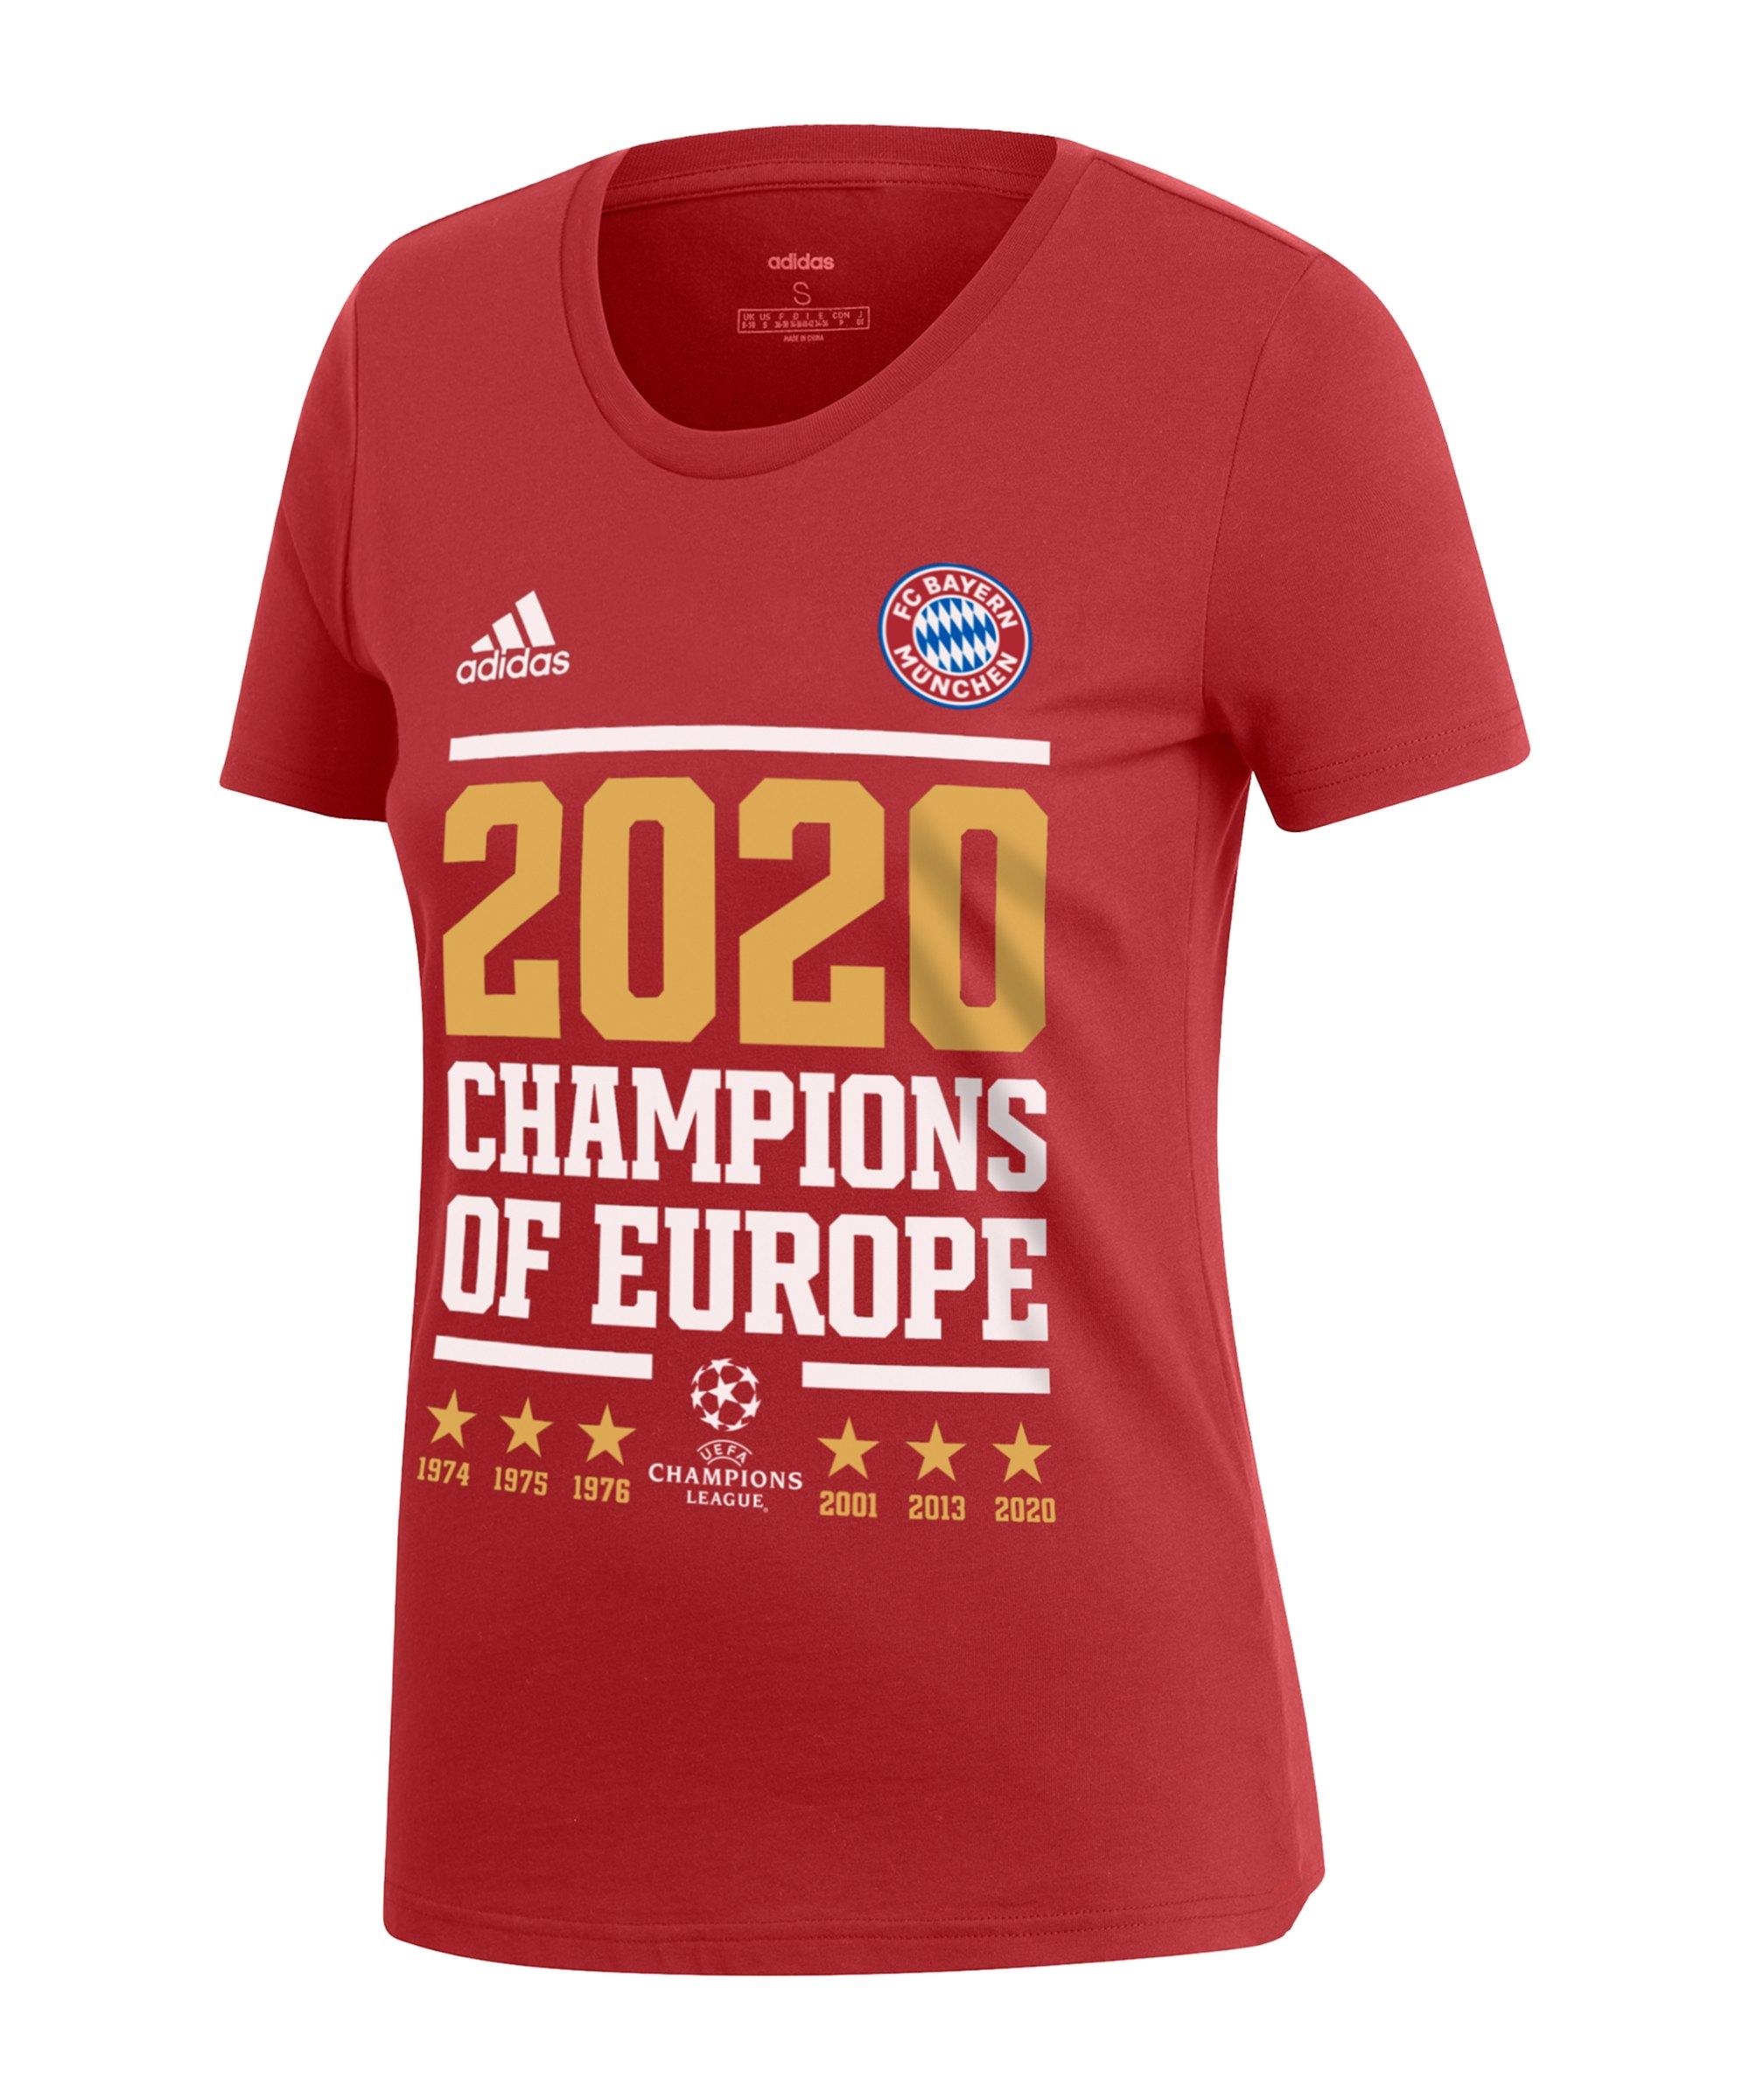 adidas FC Bayern München UCL 2020 T-Shirt Damen Rot - rot